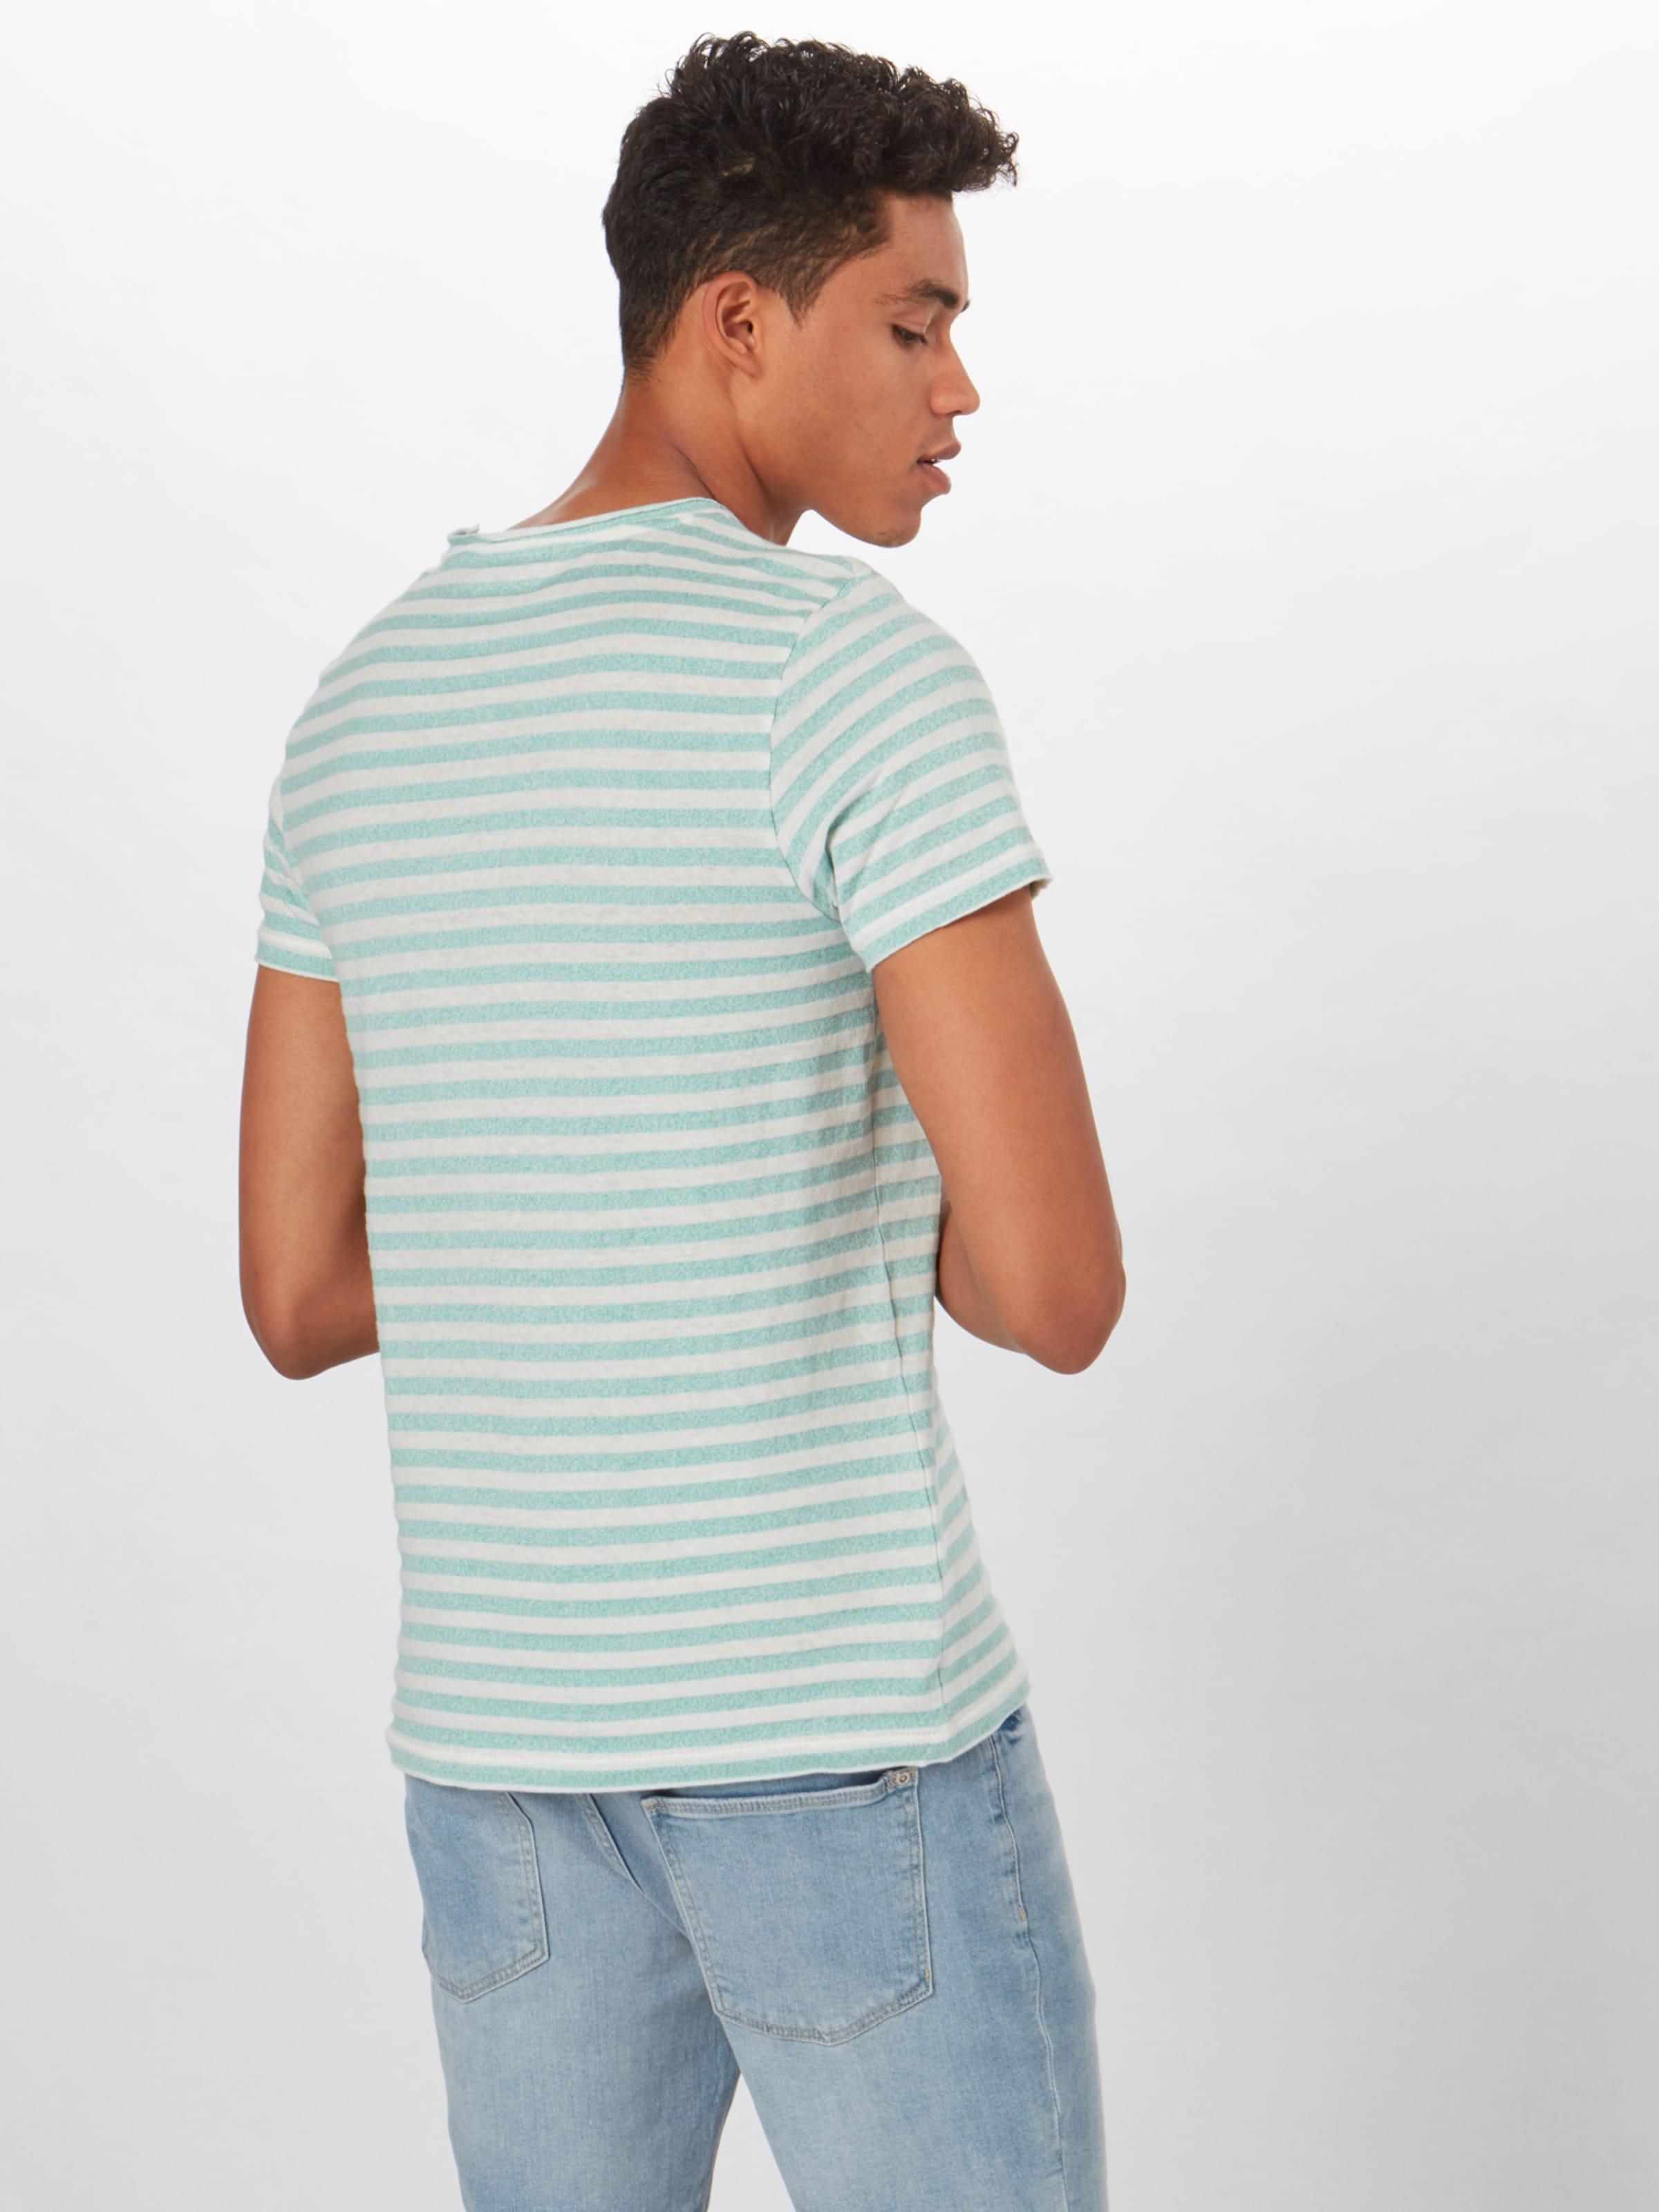 T Review shirt 'brokenstripe' NoirBlanc En Okwn0P